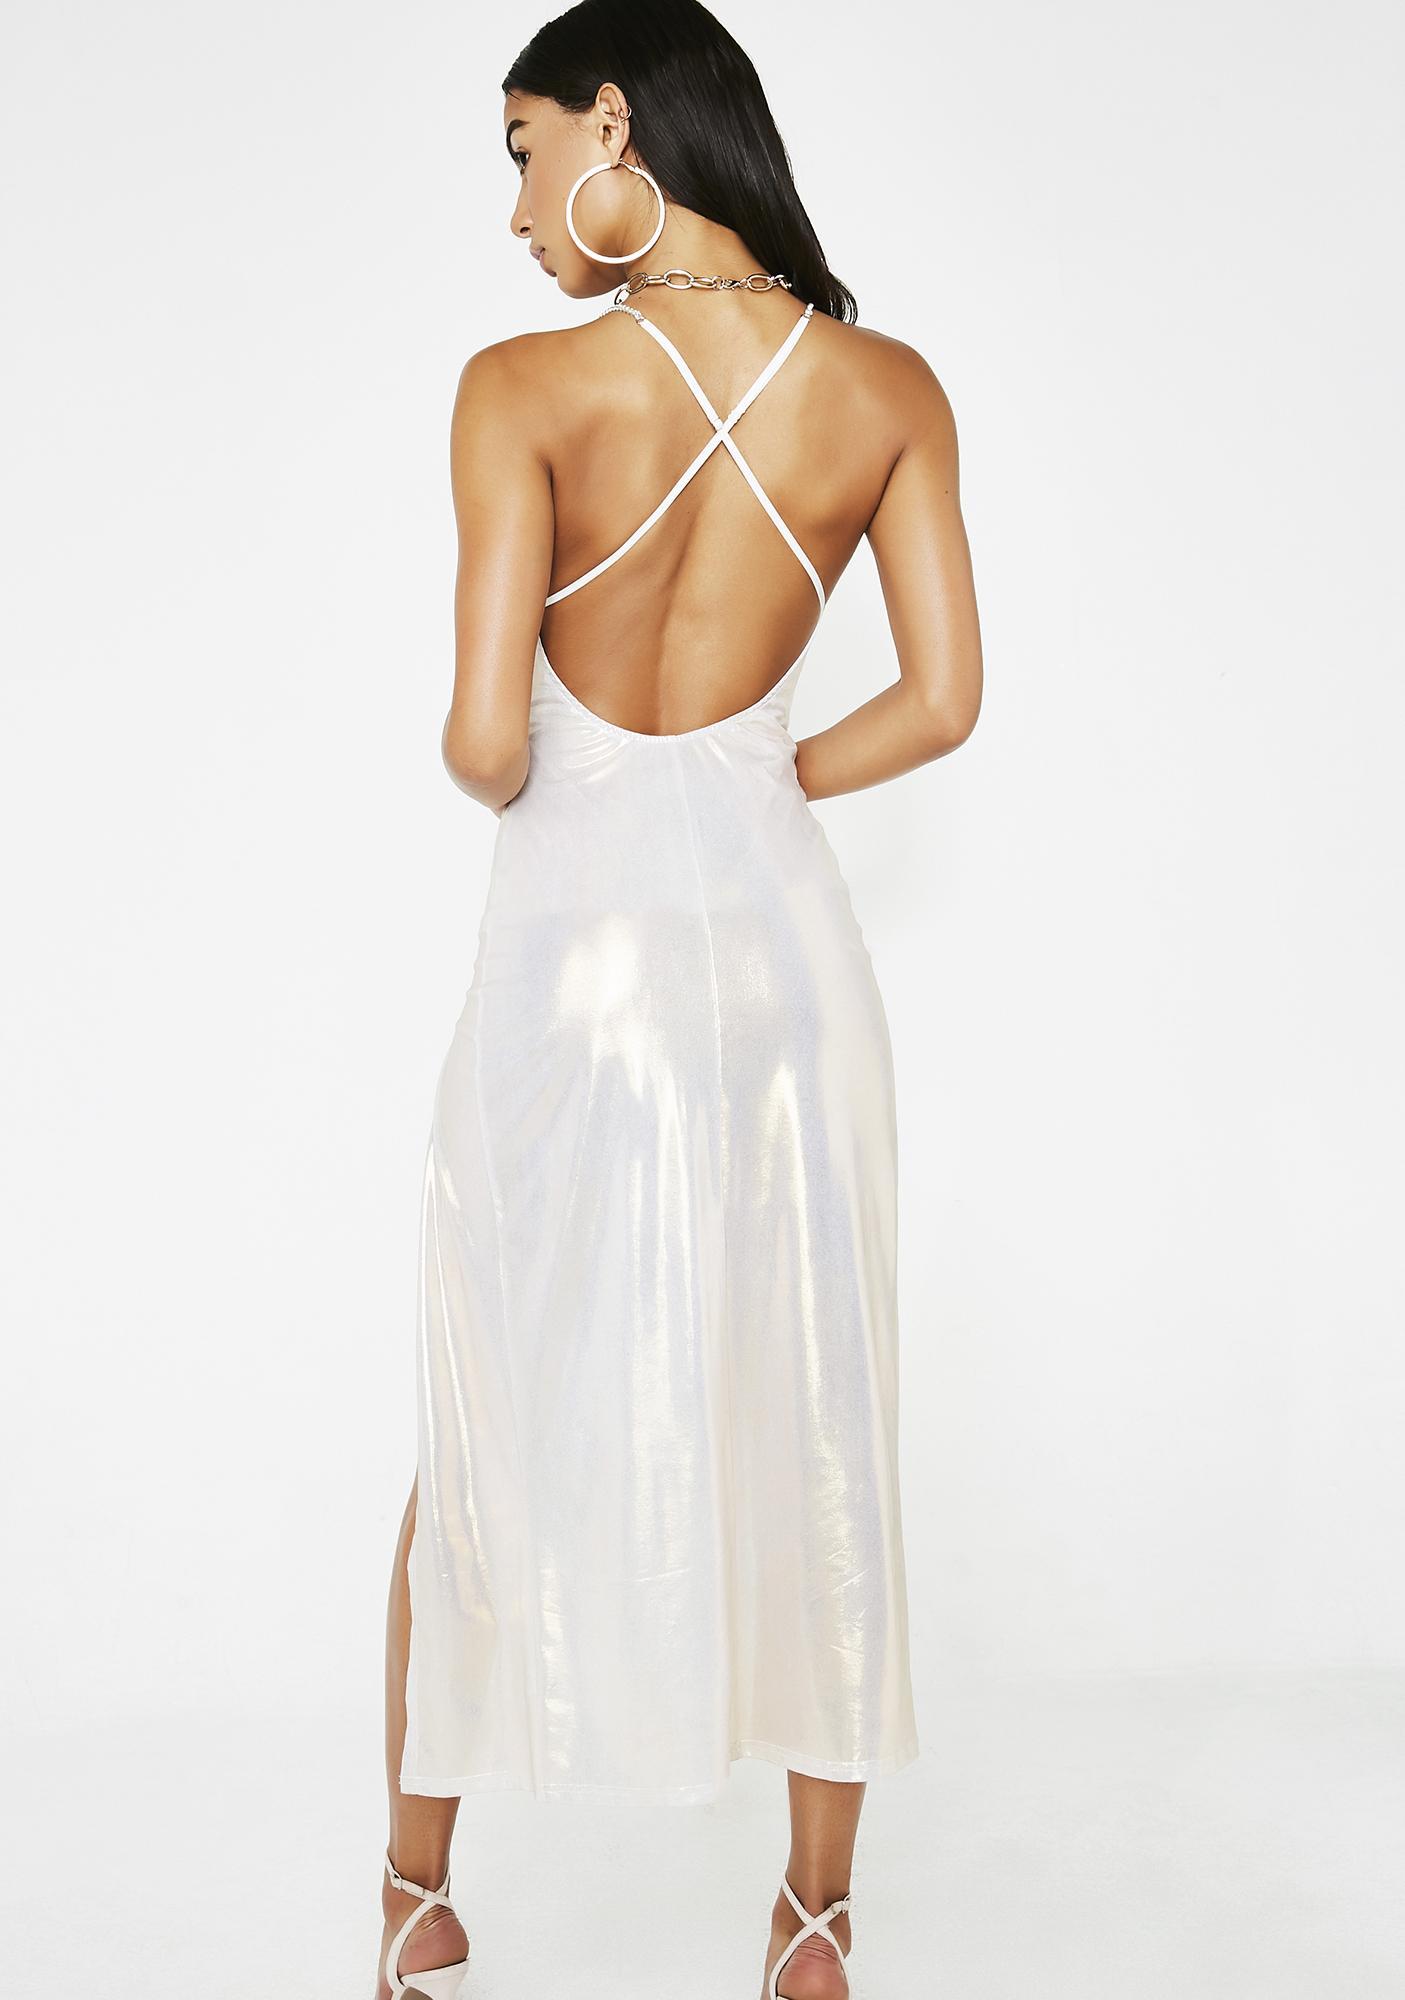 Poster Grl Young Mula Metallic Dress